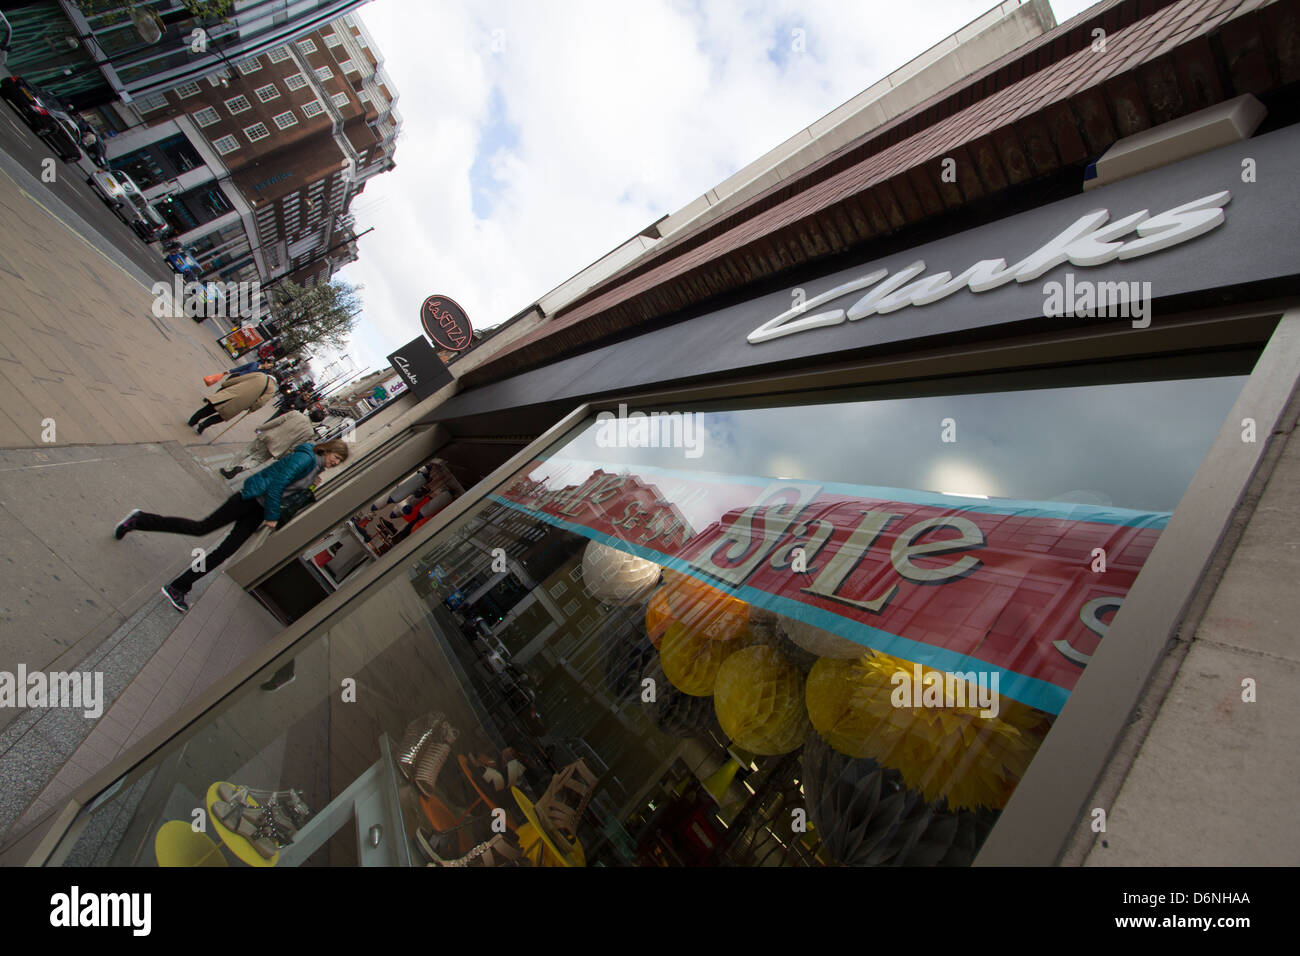 c0ffaf9d Clarks shoe shop Oxford street London Stock Photo: 55793650 - Alamy